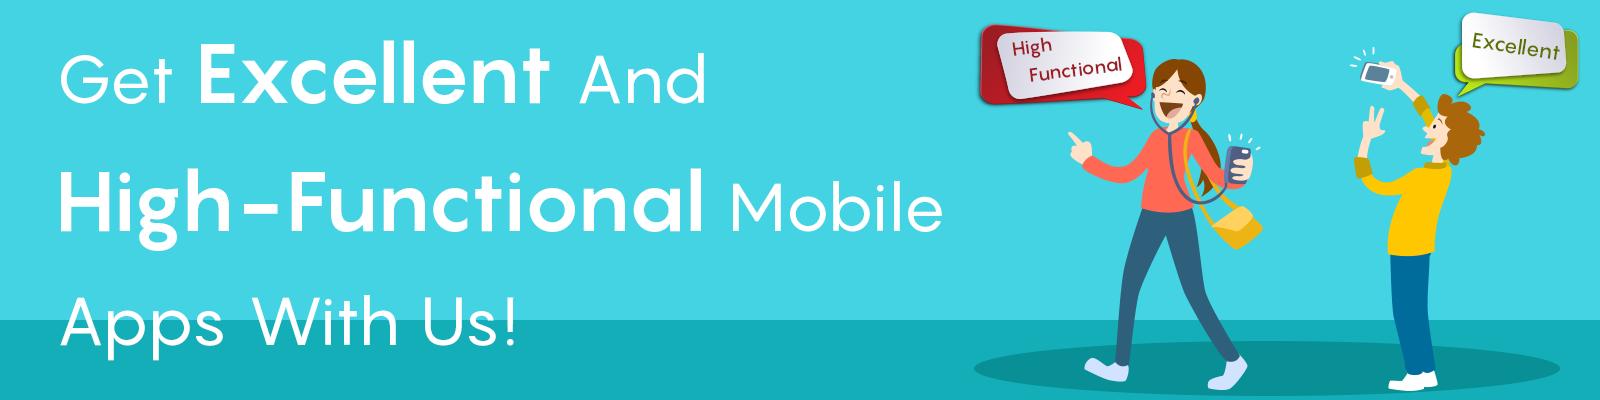 mobile app development company new castle